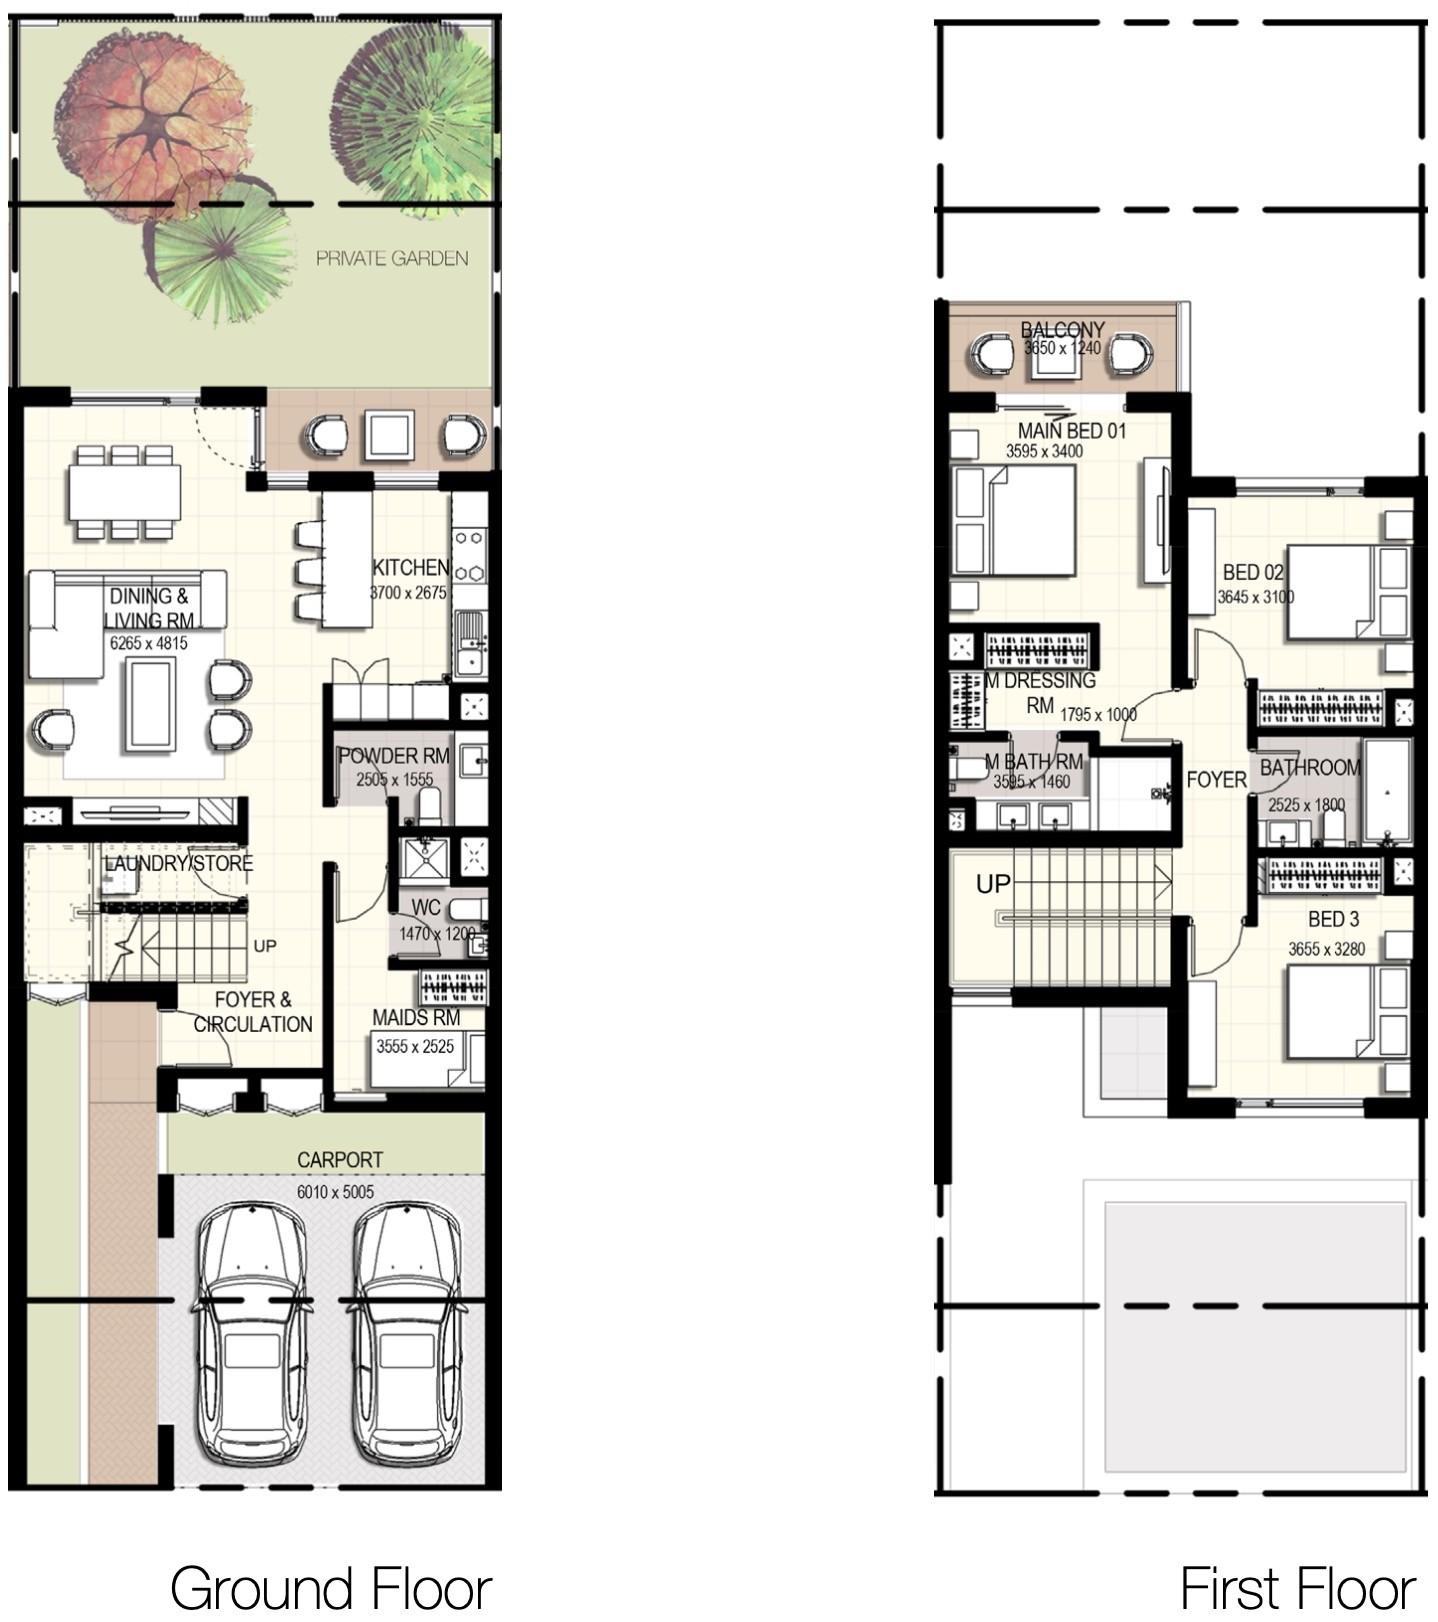 Urbana Townhouses III in Emaar South – Townhouses for Sale in Dubai